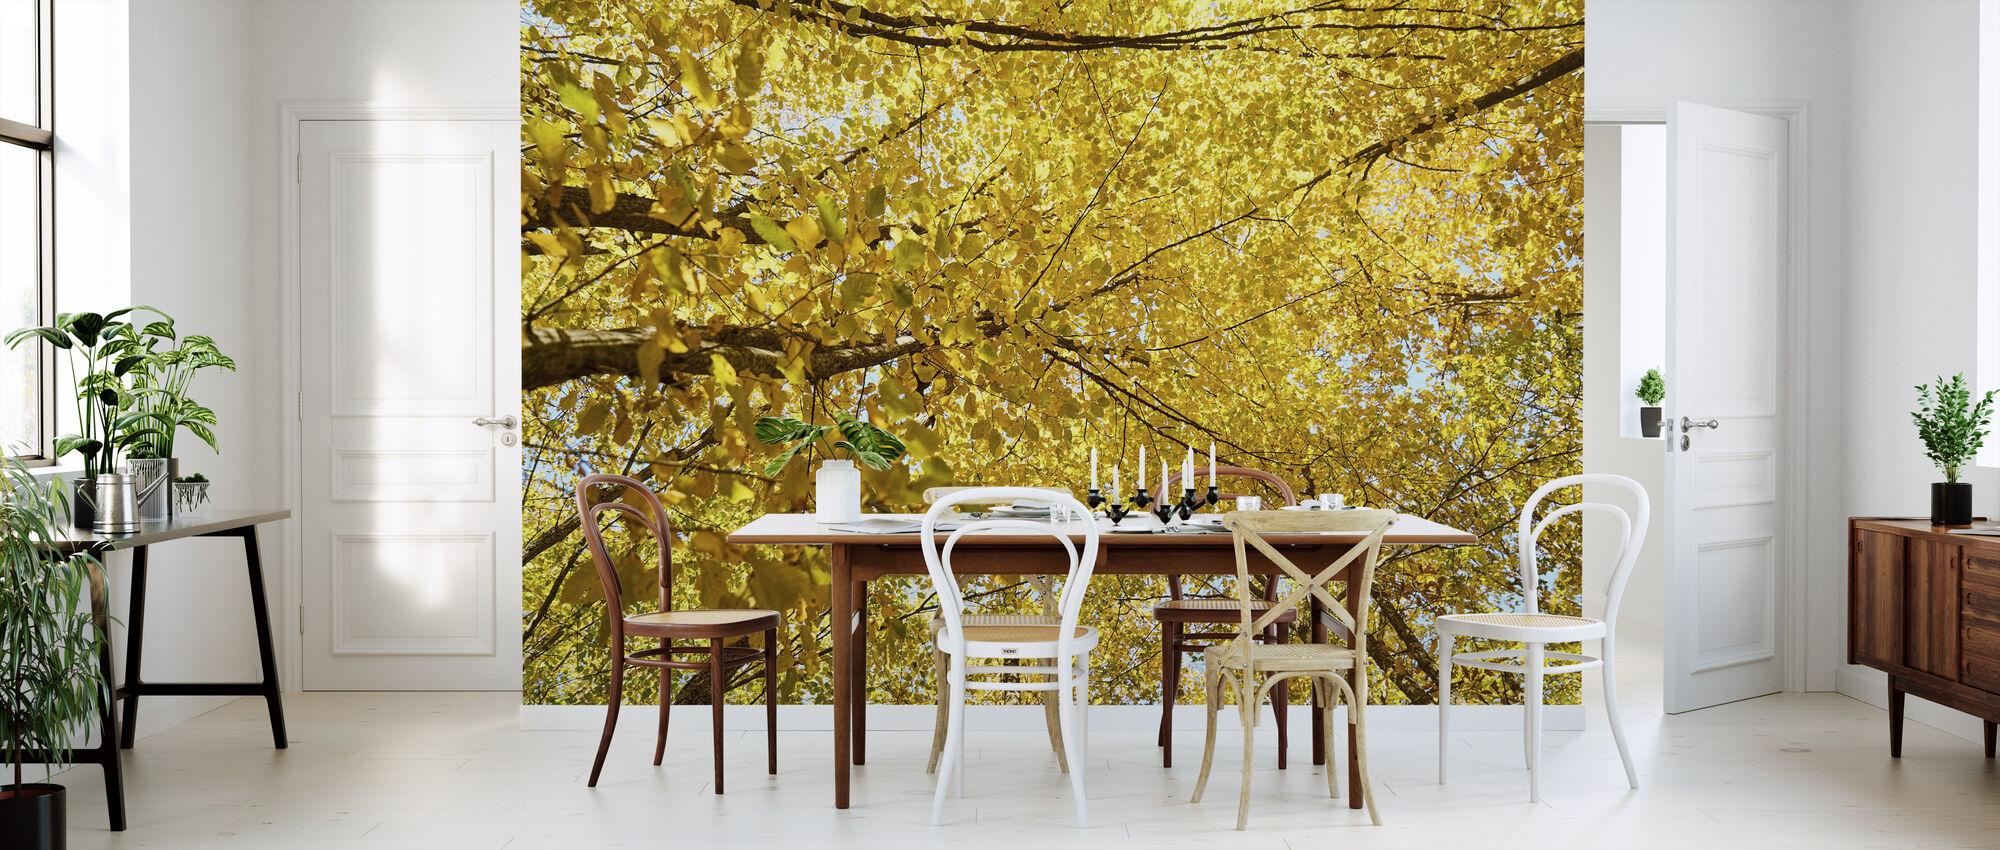 Yellow Leaves - Wallpaper - Kitchen